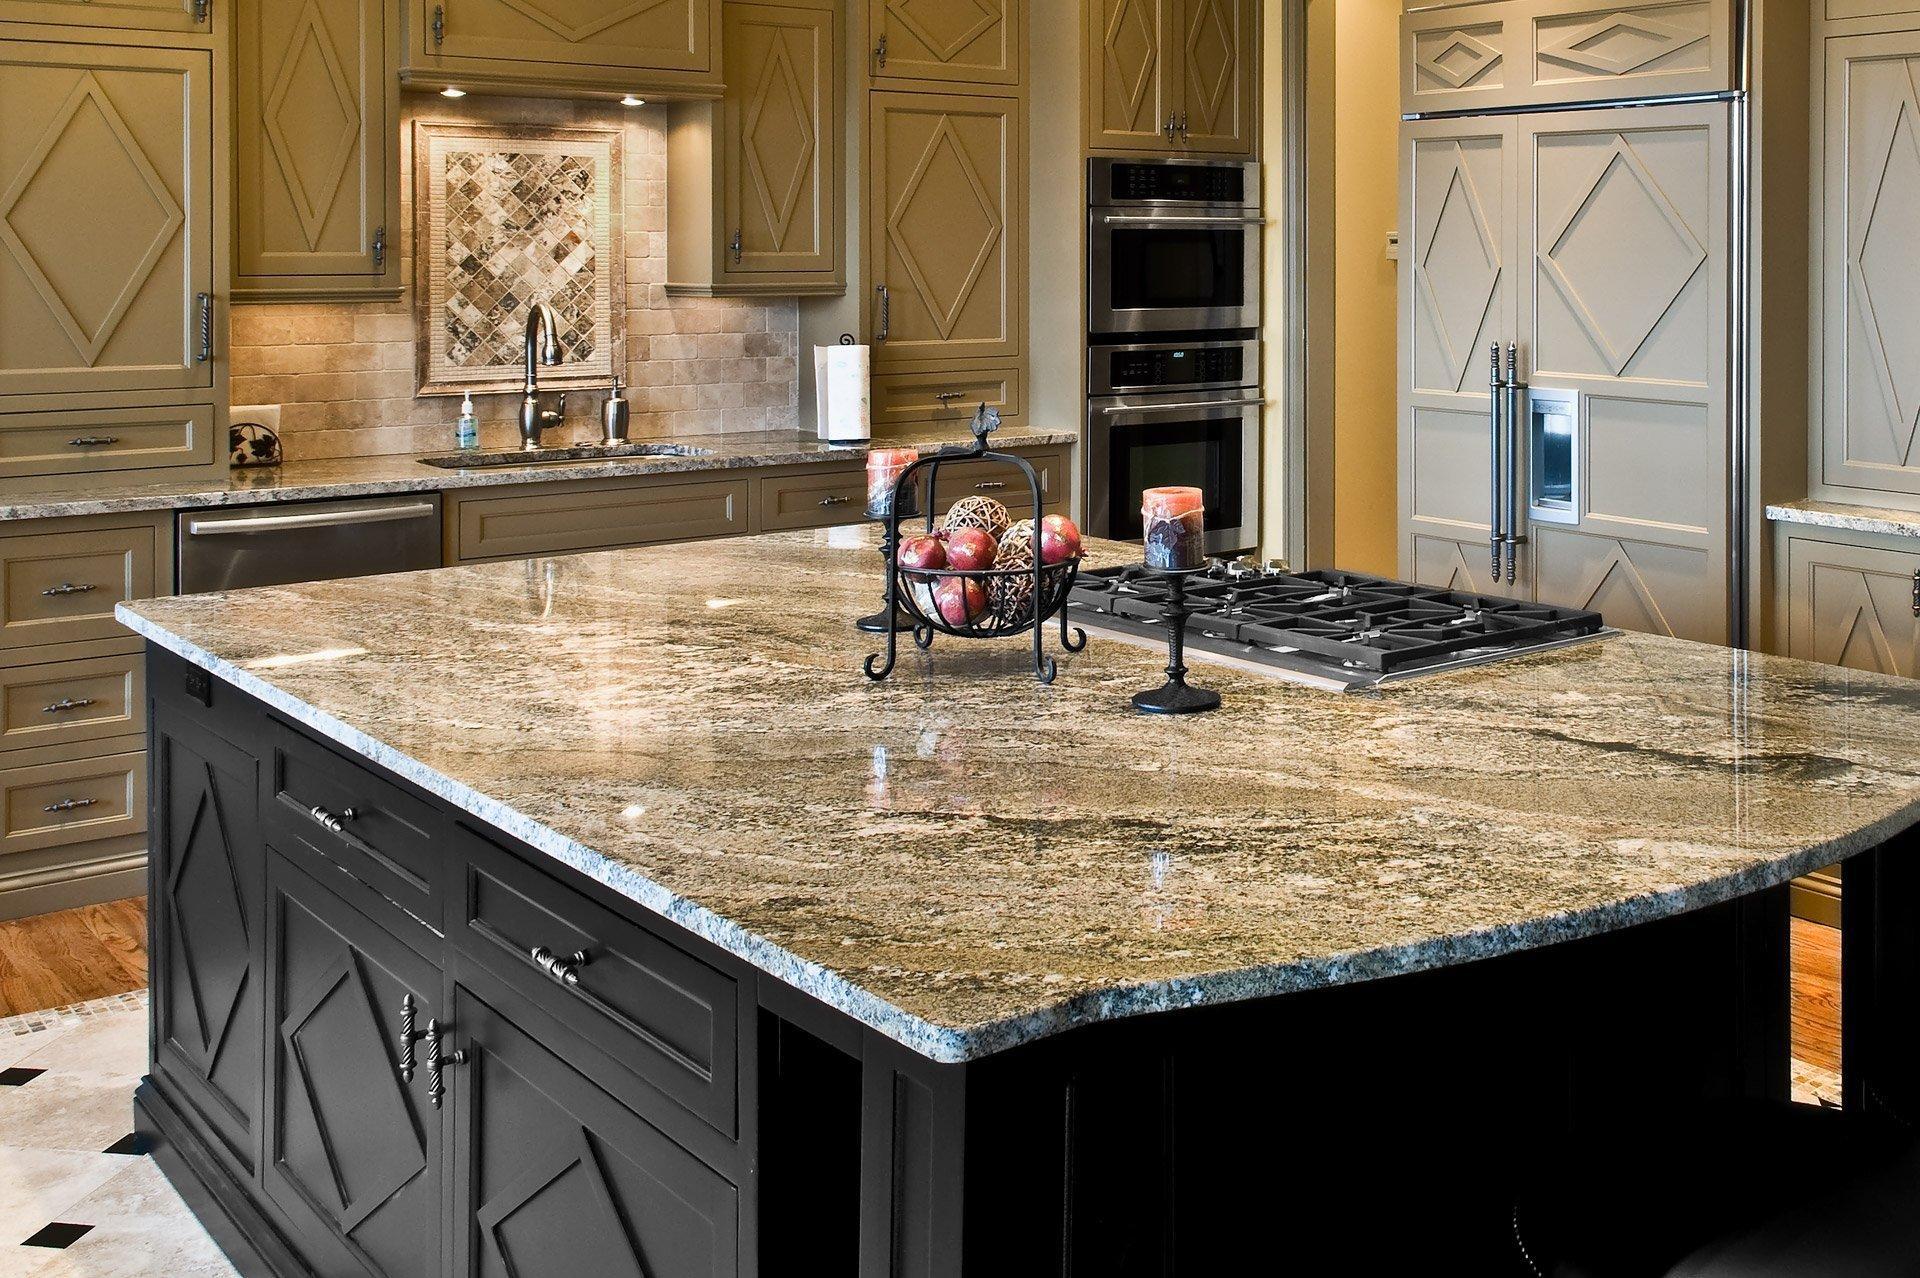 Affordable Granite Marble Quartz Countertops In Rhode Island Ri